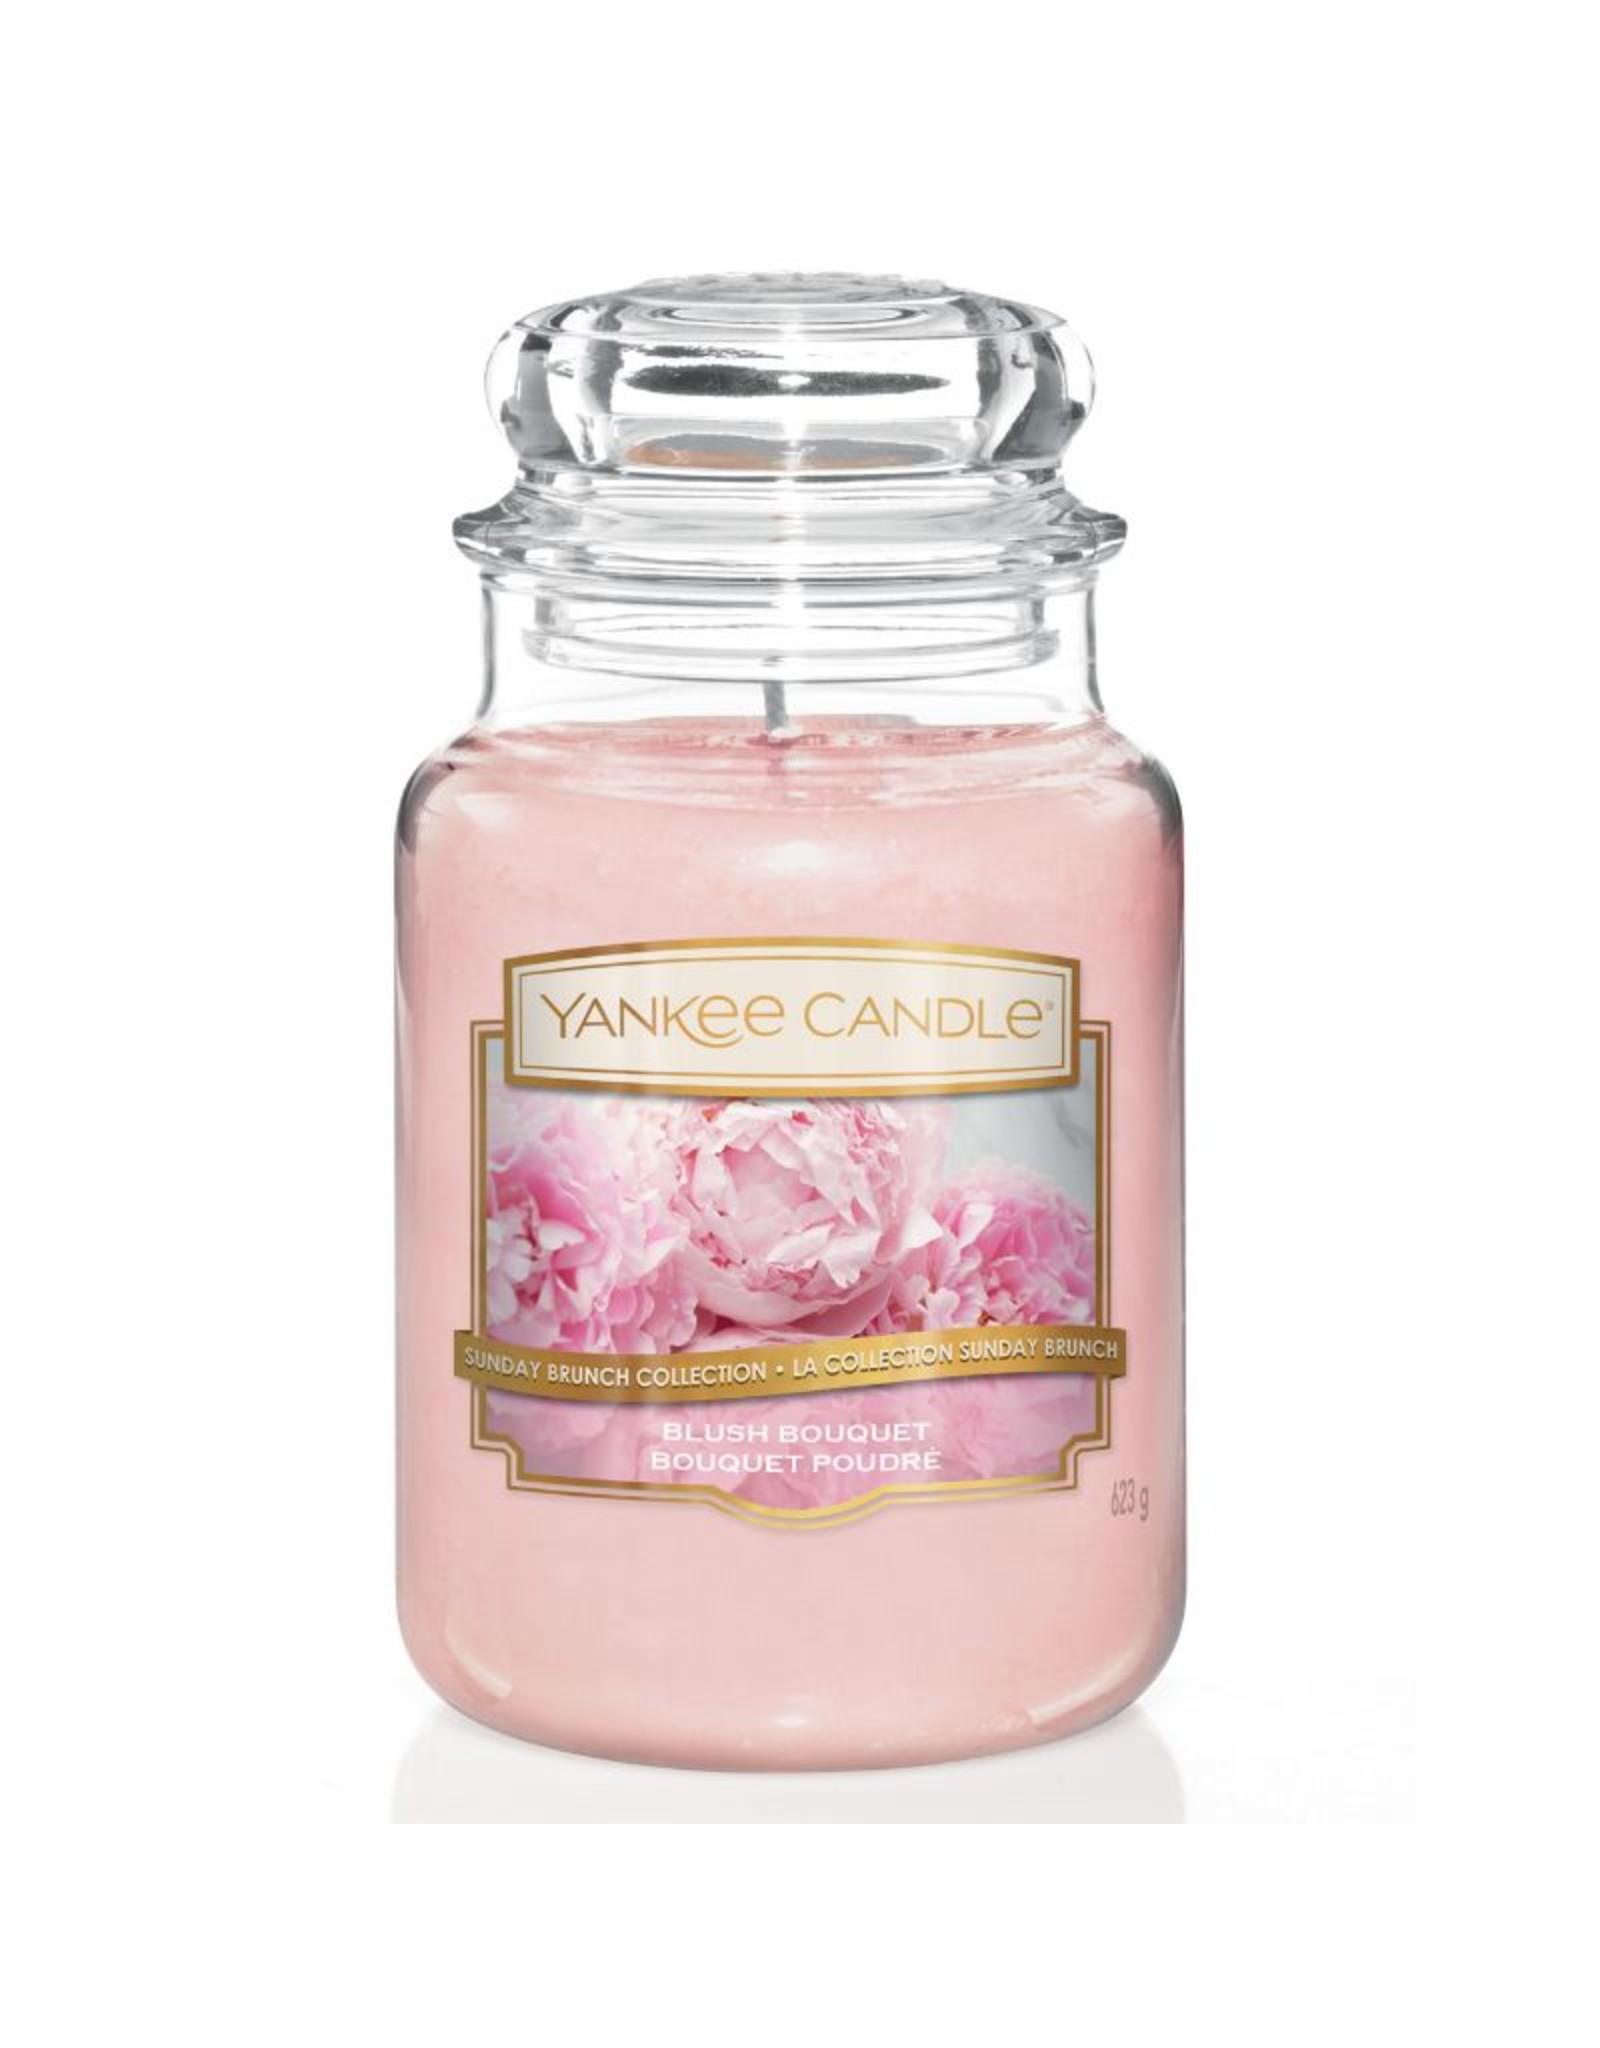 Yankee Candle Blush Bouquet - Large jar